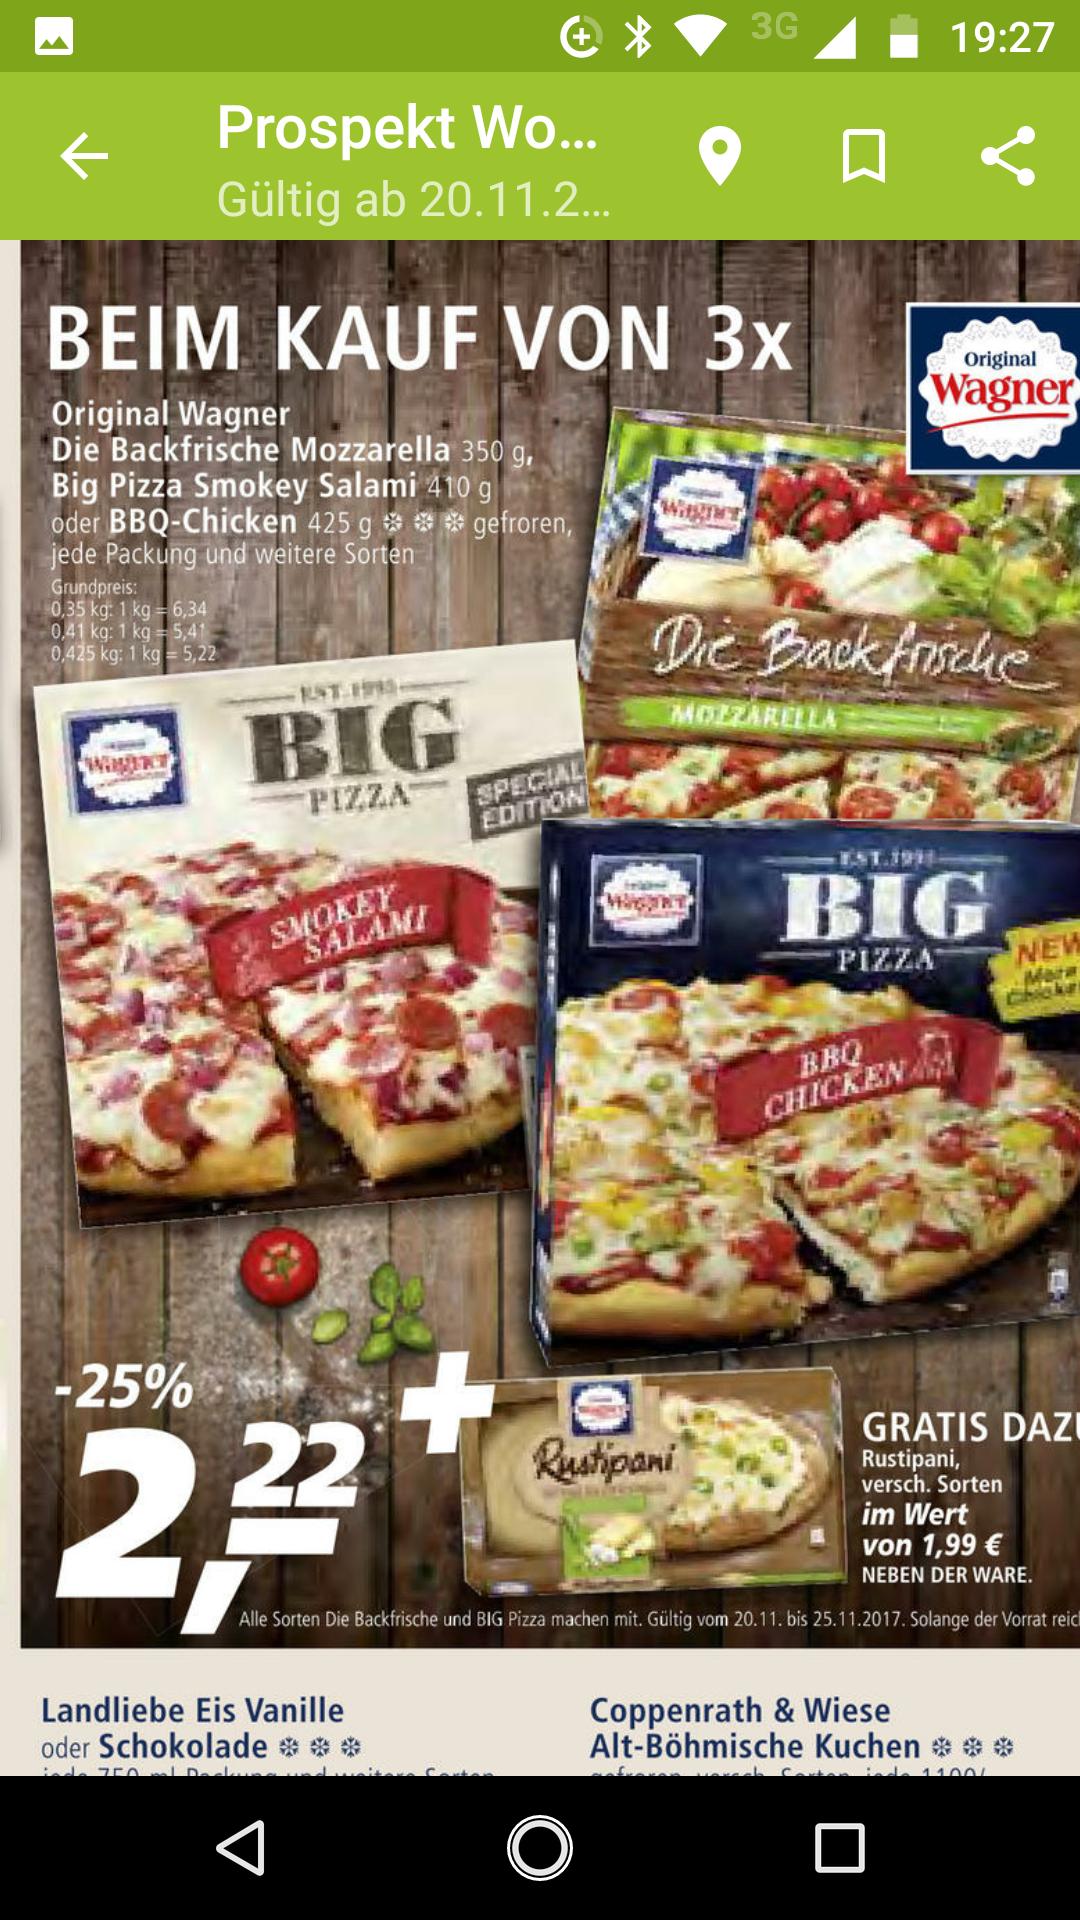 3x Wagner Pizza für 6,66€+ 1x Rustipani Gratis